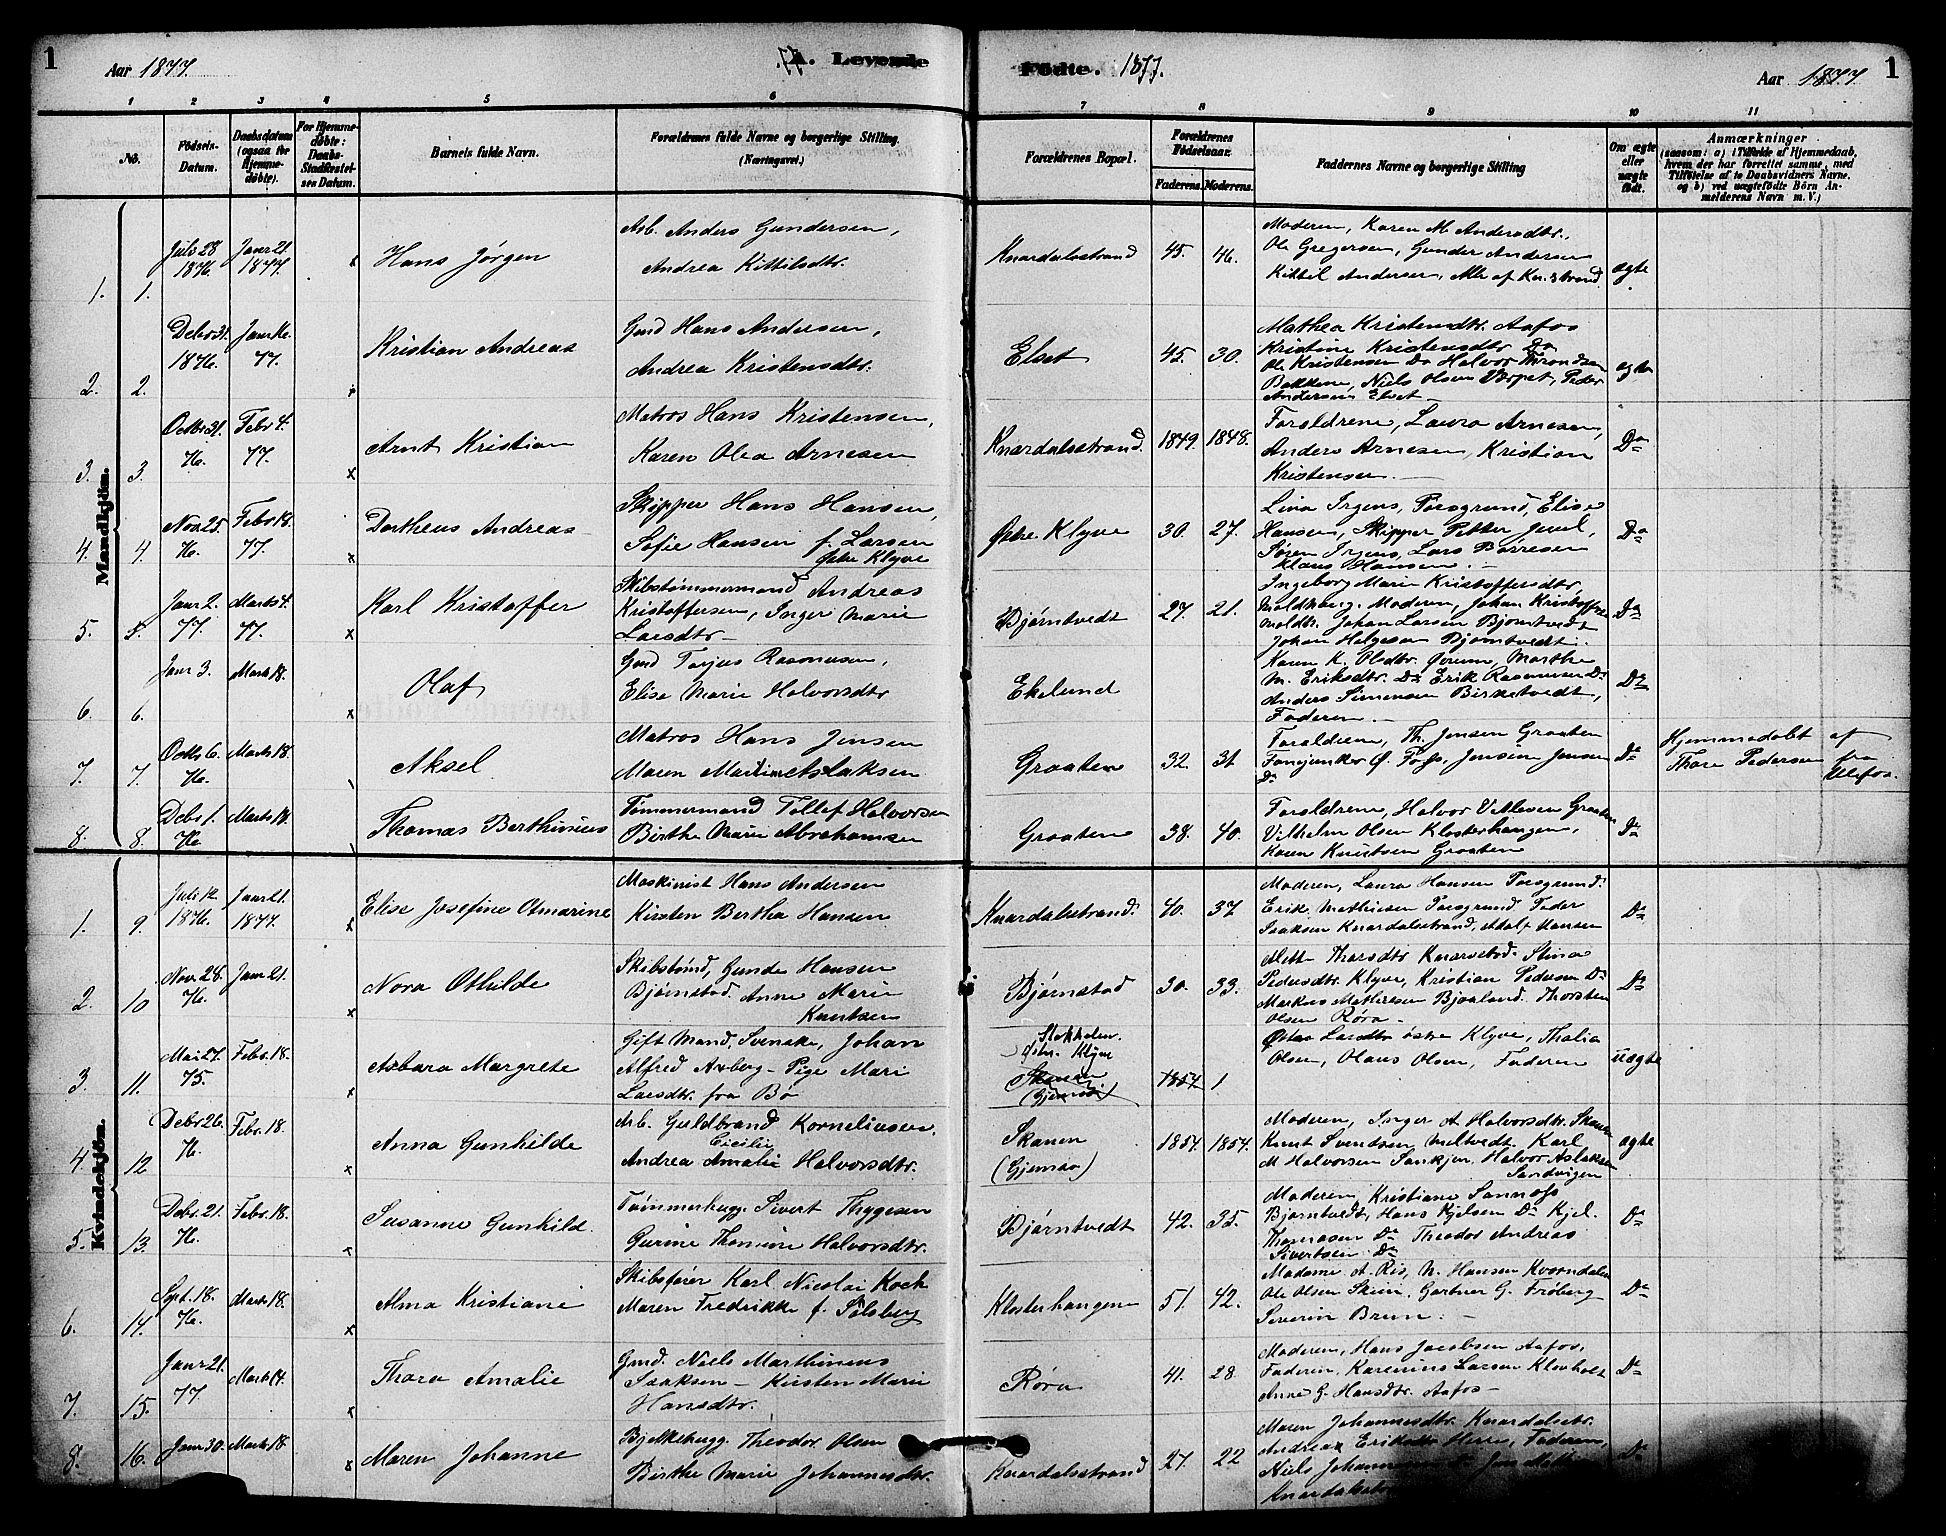 SAKO, Solum kirkebøker, F/Fa/L0009: Ministerialbok nr. I 9, 1877-1887, s. 1